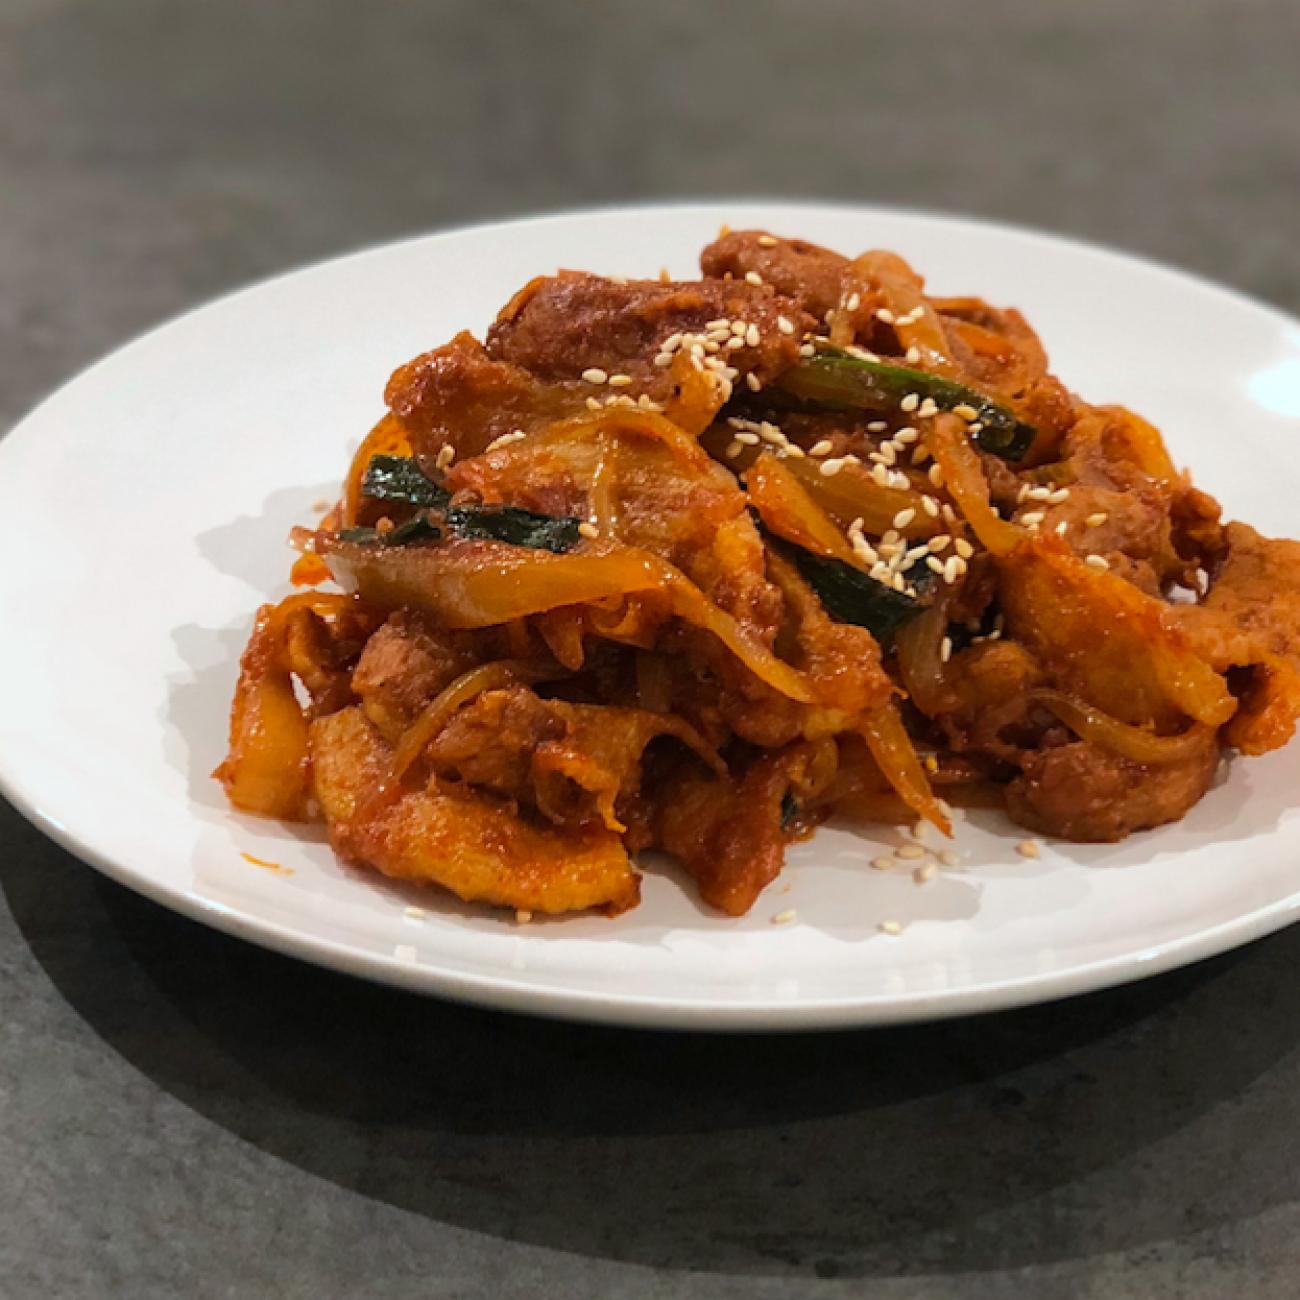 Spicy Stir-fried Pork Slices (Jeyuk Bokkeum 제육볶음)